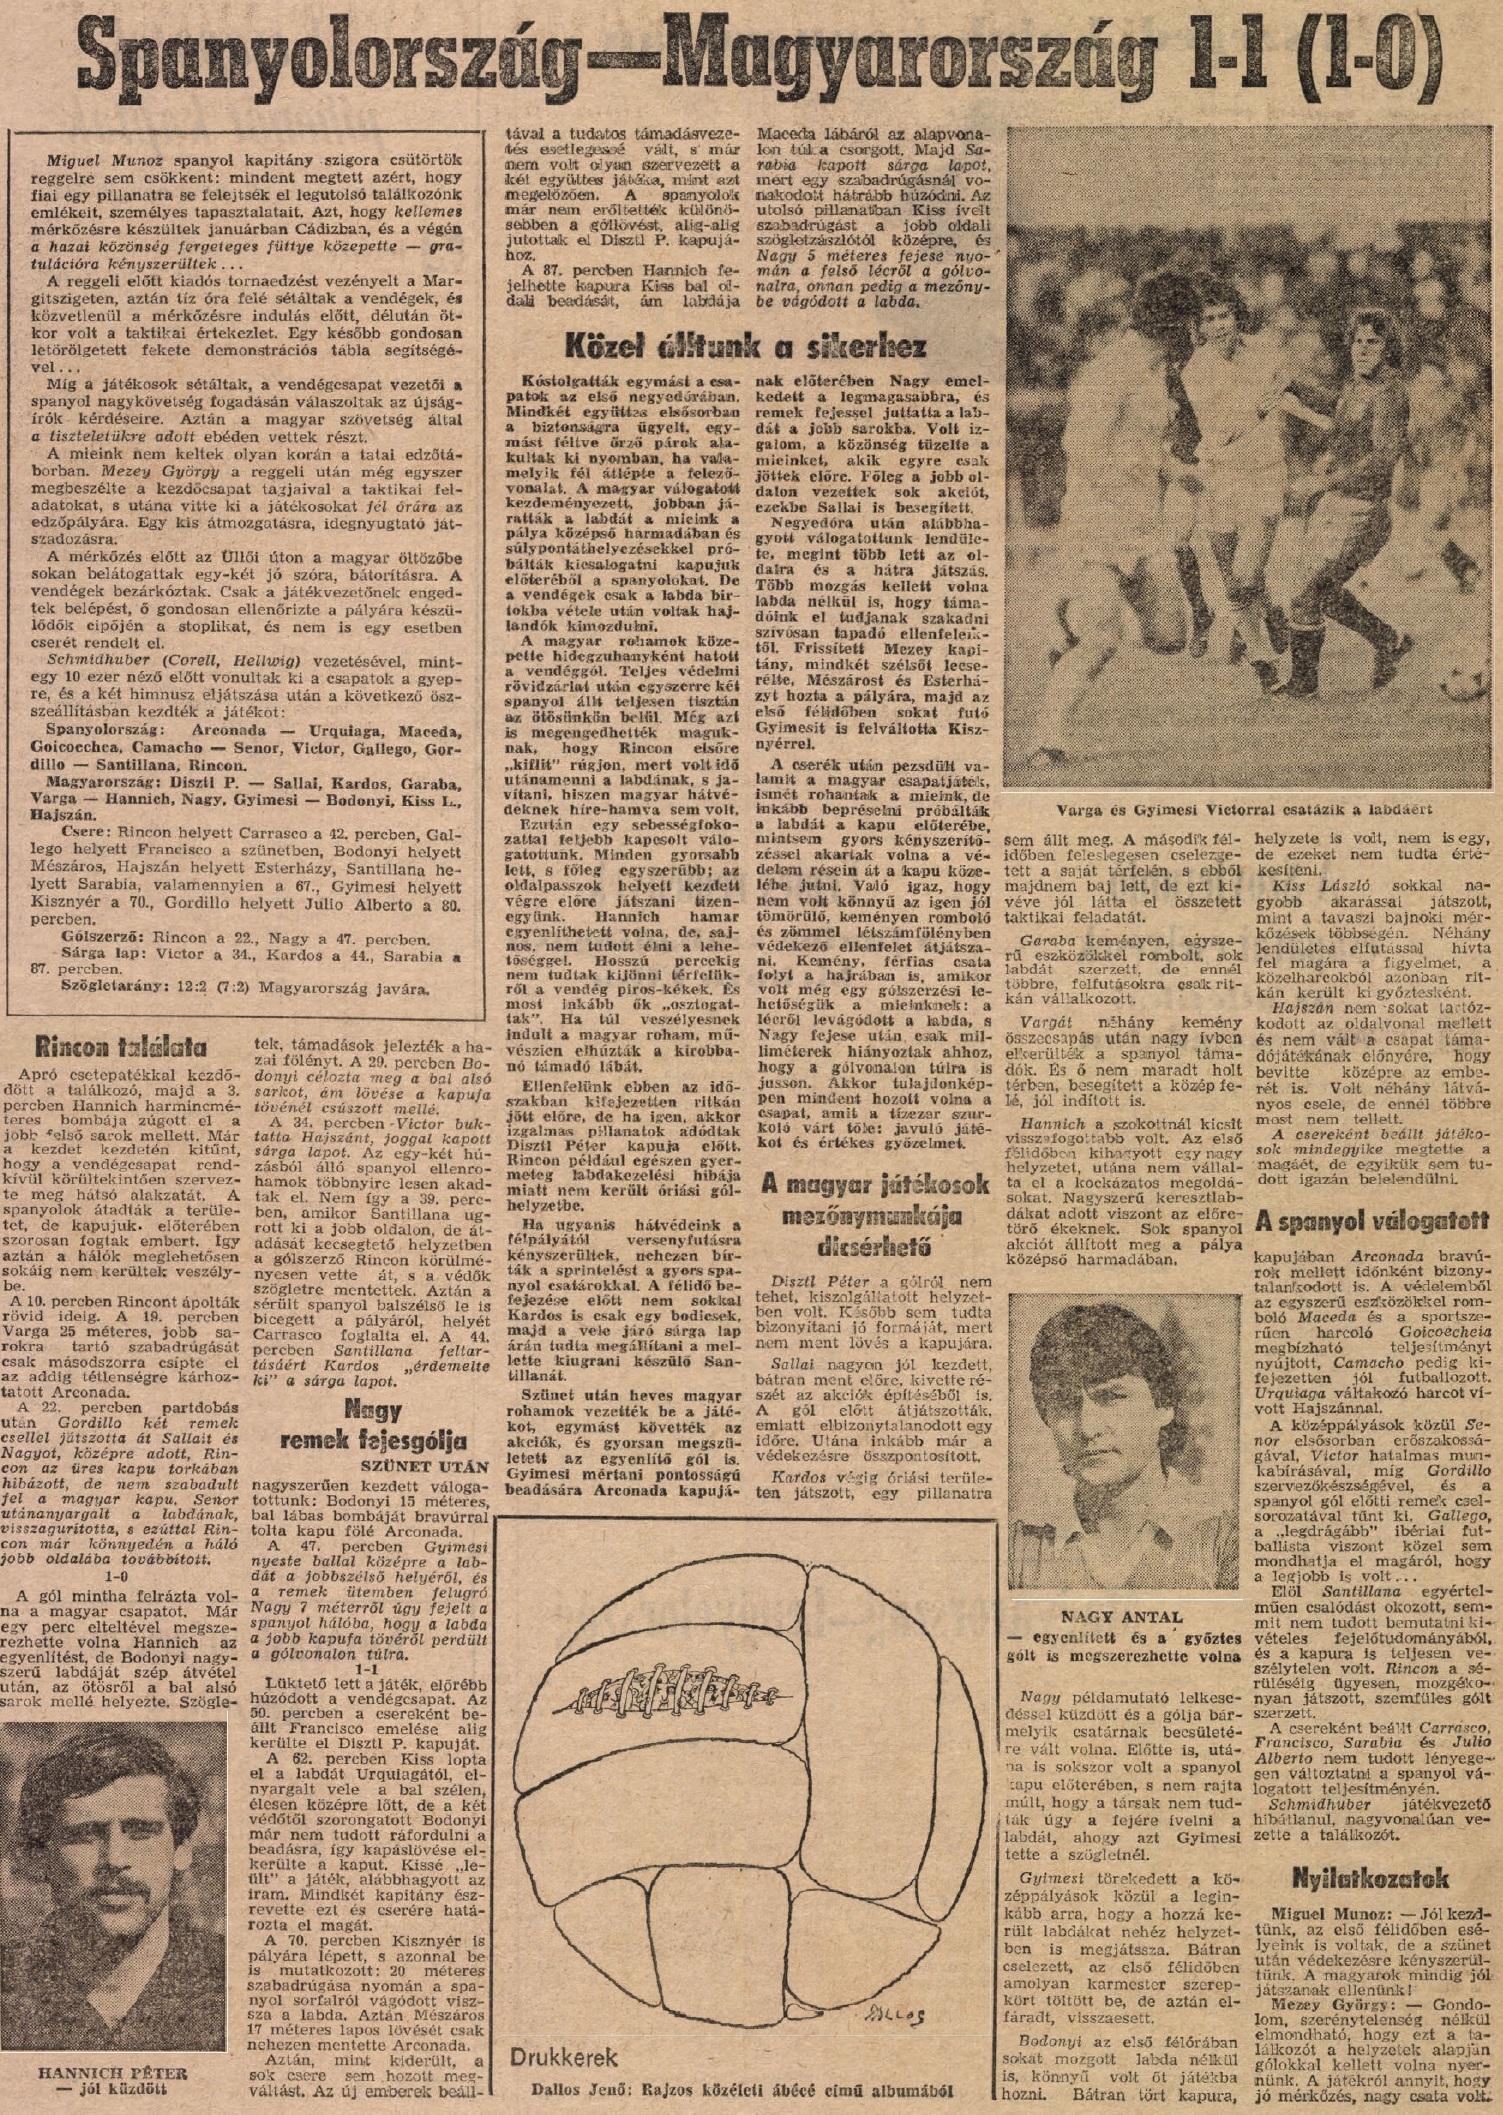 idokapszula_nb_i_1983_84_magyarorszag_spanyolorszag_merkozes.jpg